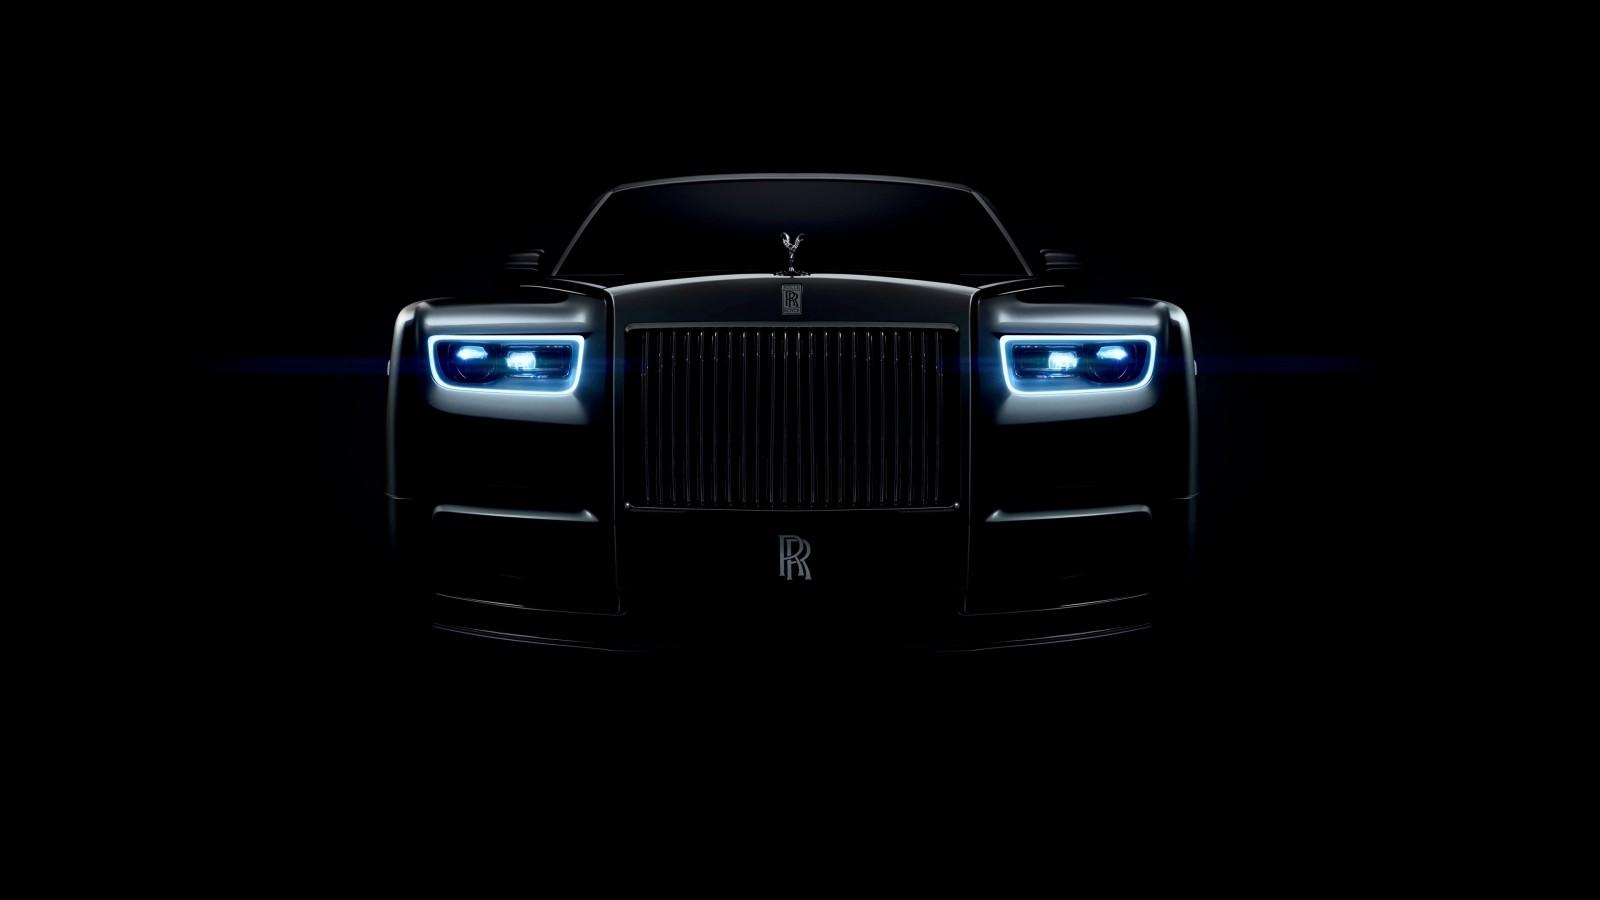 3d Music Wallpapers Desktop Rolls Royce Phantom 2018 4k Wallpapers Hd Wallpapers